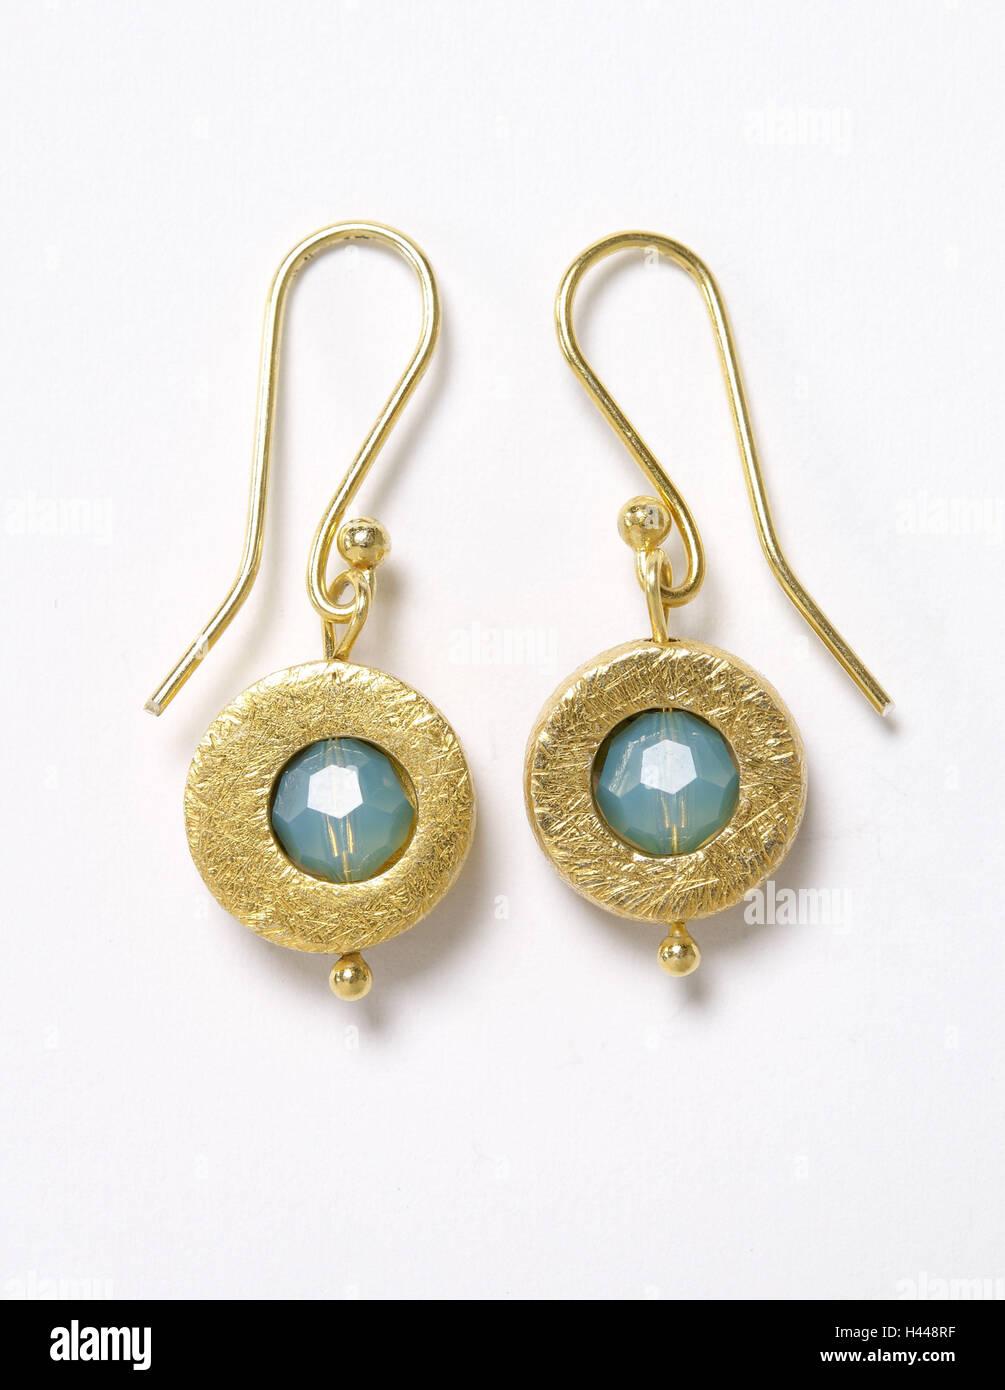 86cd22d75dff Turquoise Earrings Imágenes De Stock   Turquoise Earrings Fotos De ...